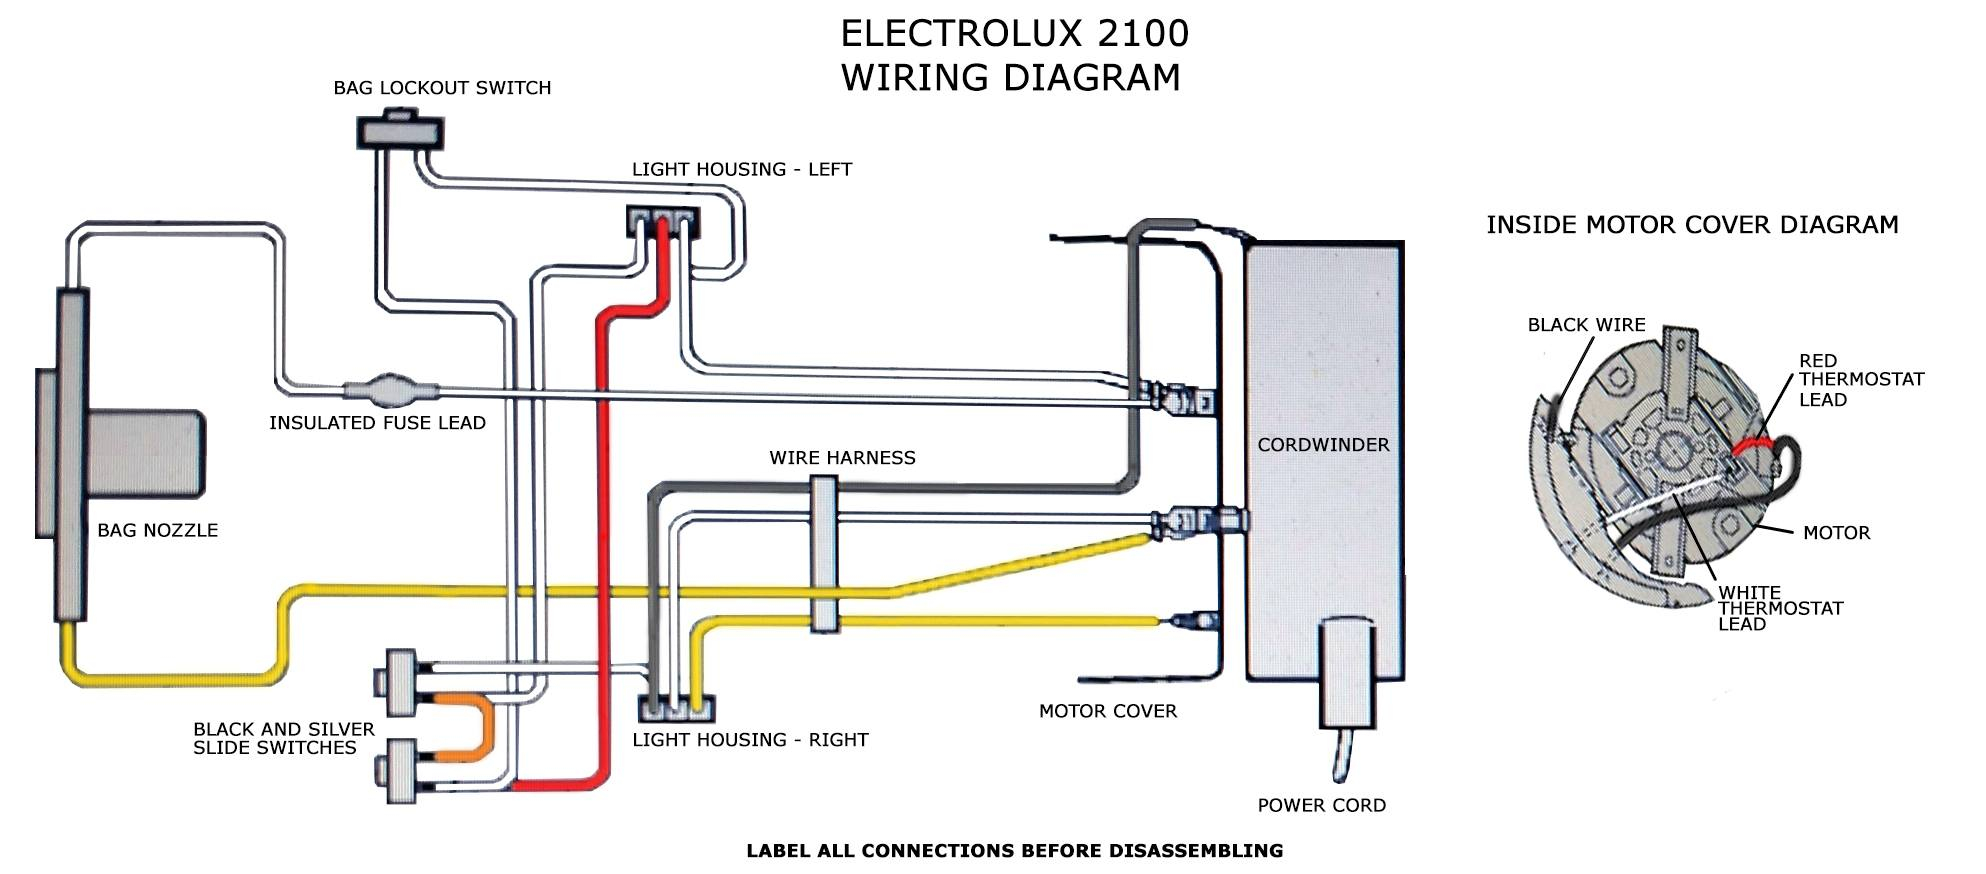 diagram of oreck wiring diagram oreck upright lungo www tintenglueck de diagram of orca wiring diagram oreck upright lungo